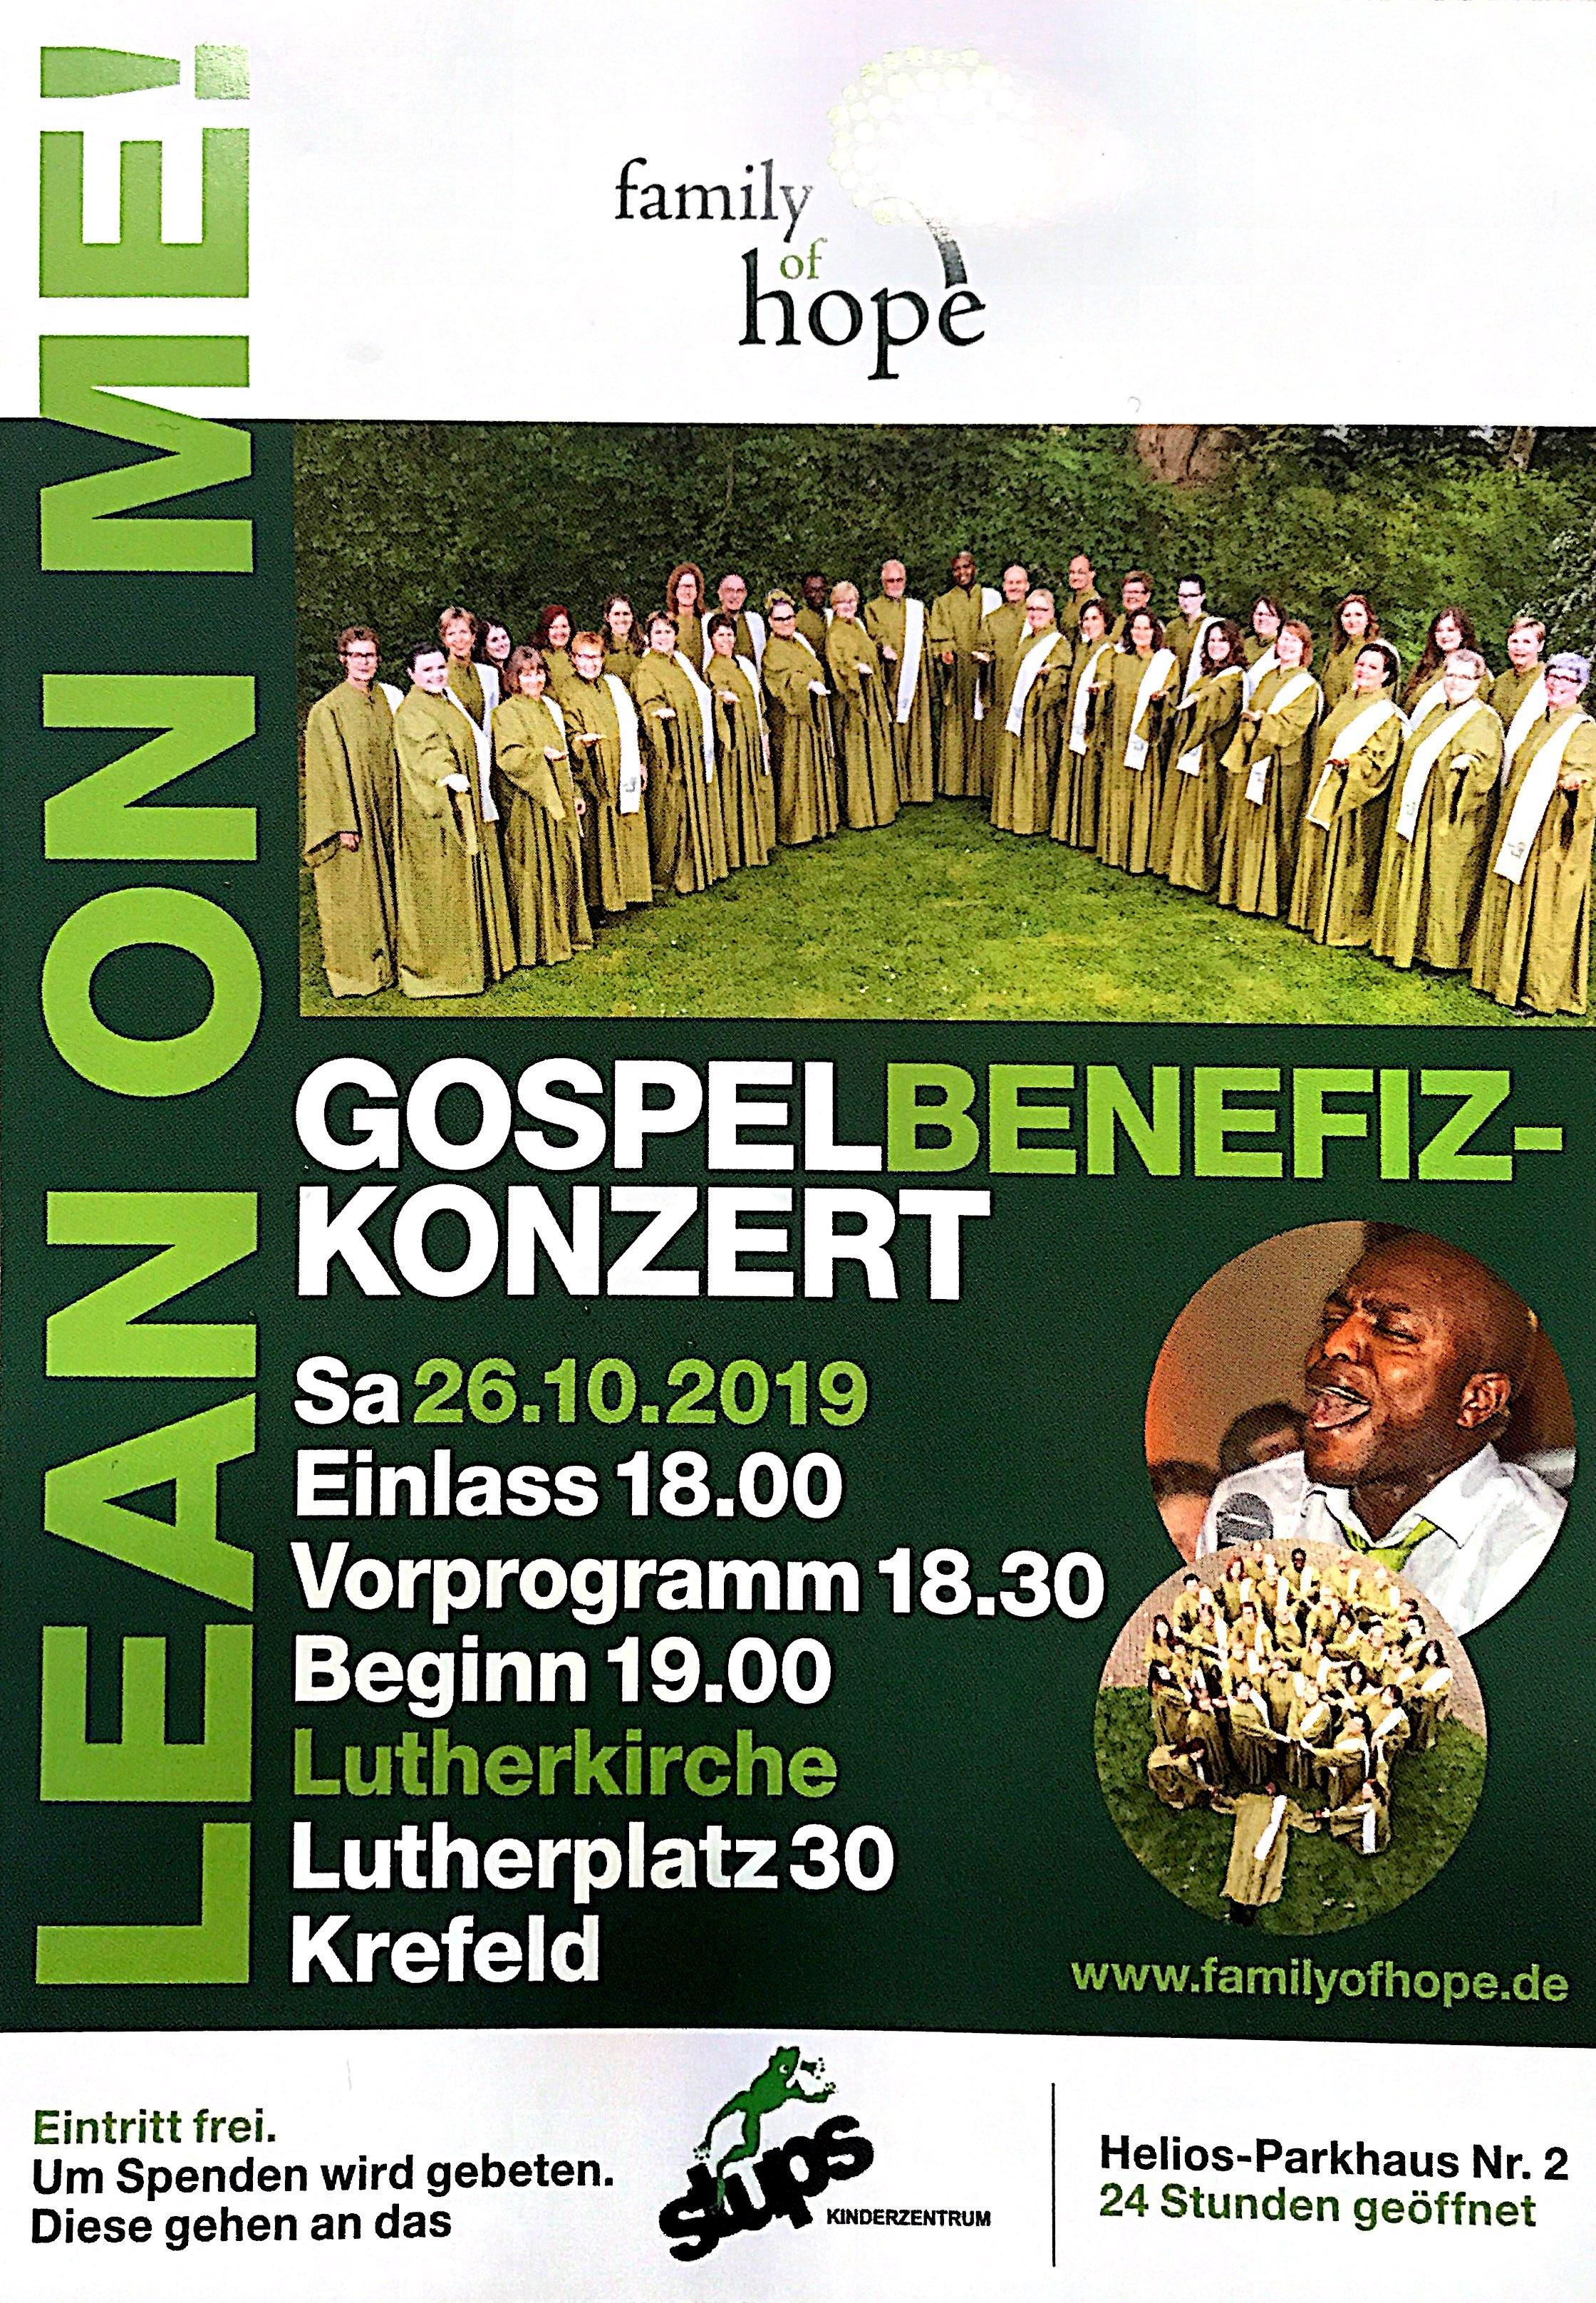 Benefitzkonzert 2019-10-26